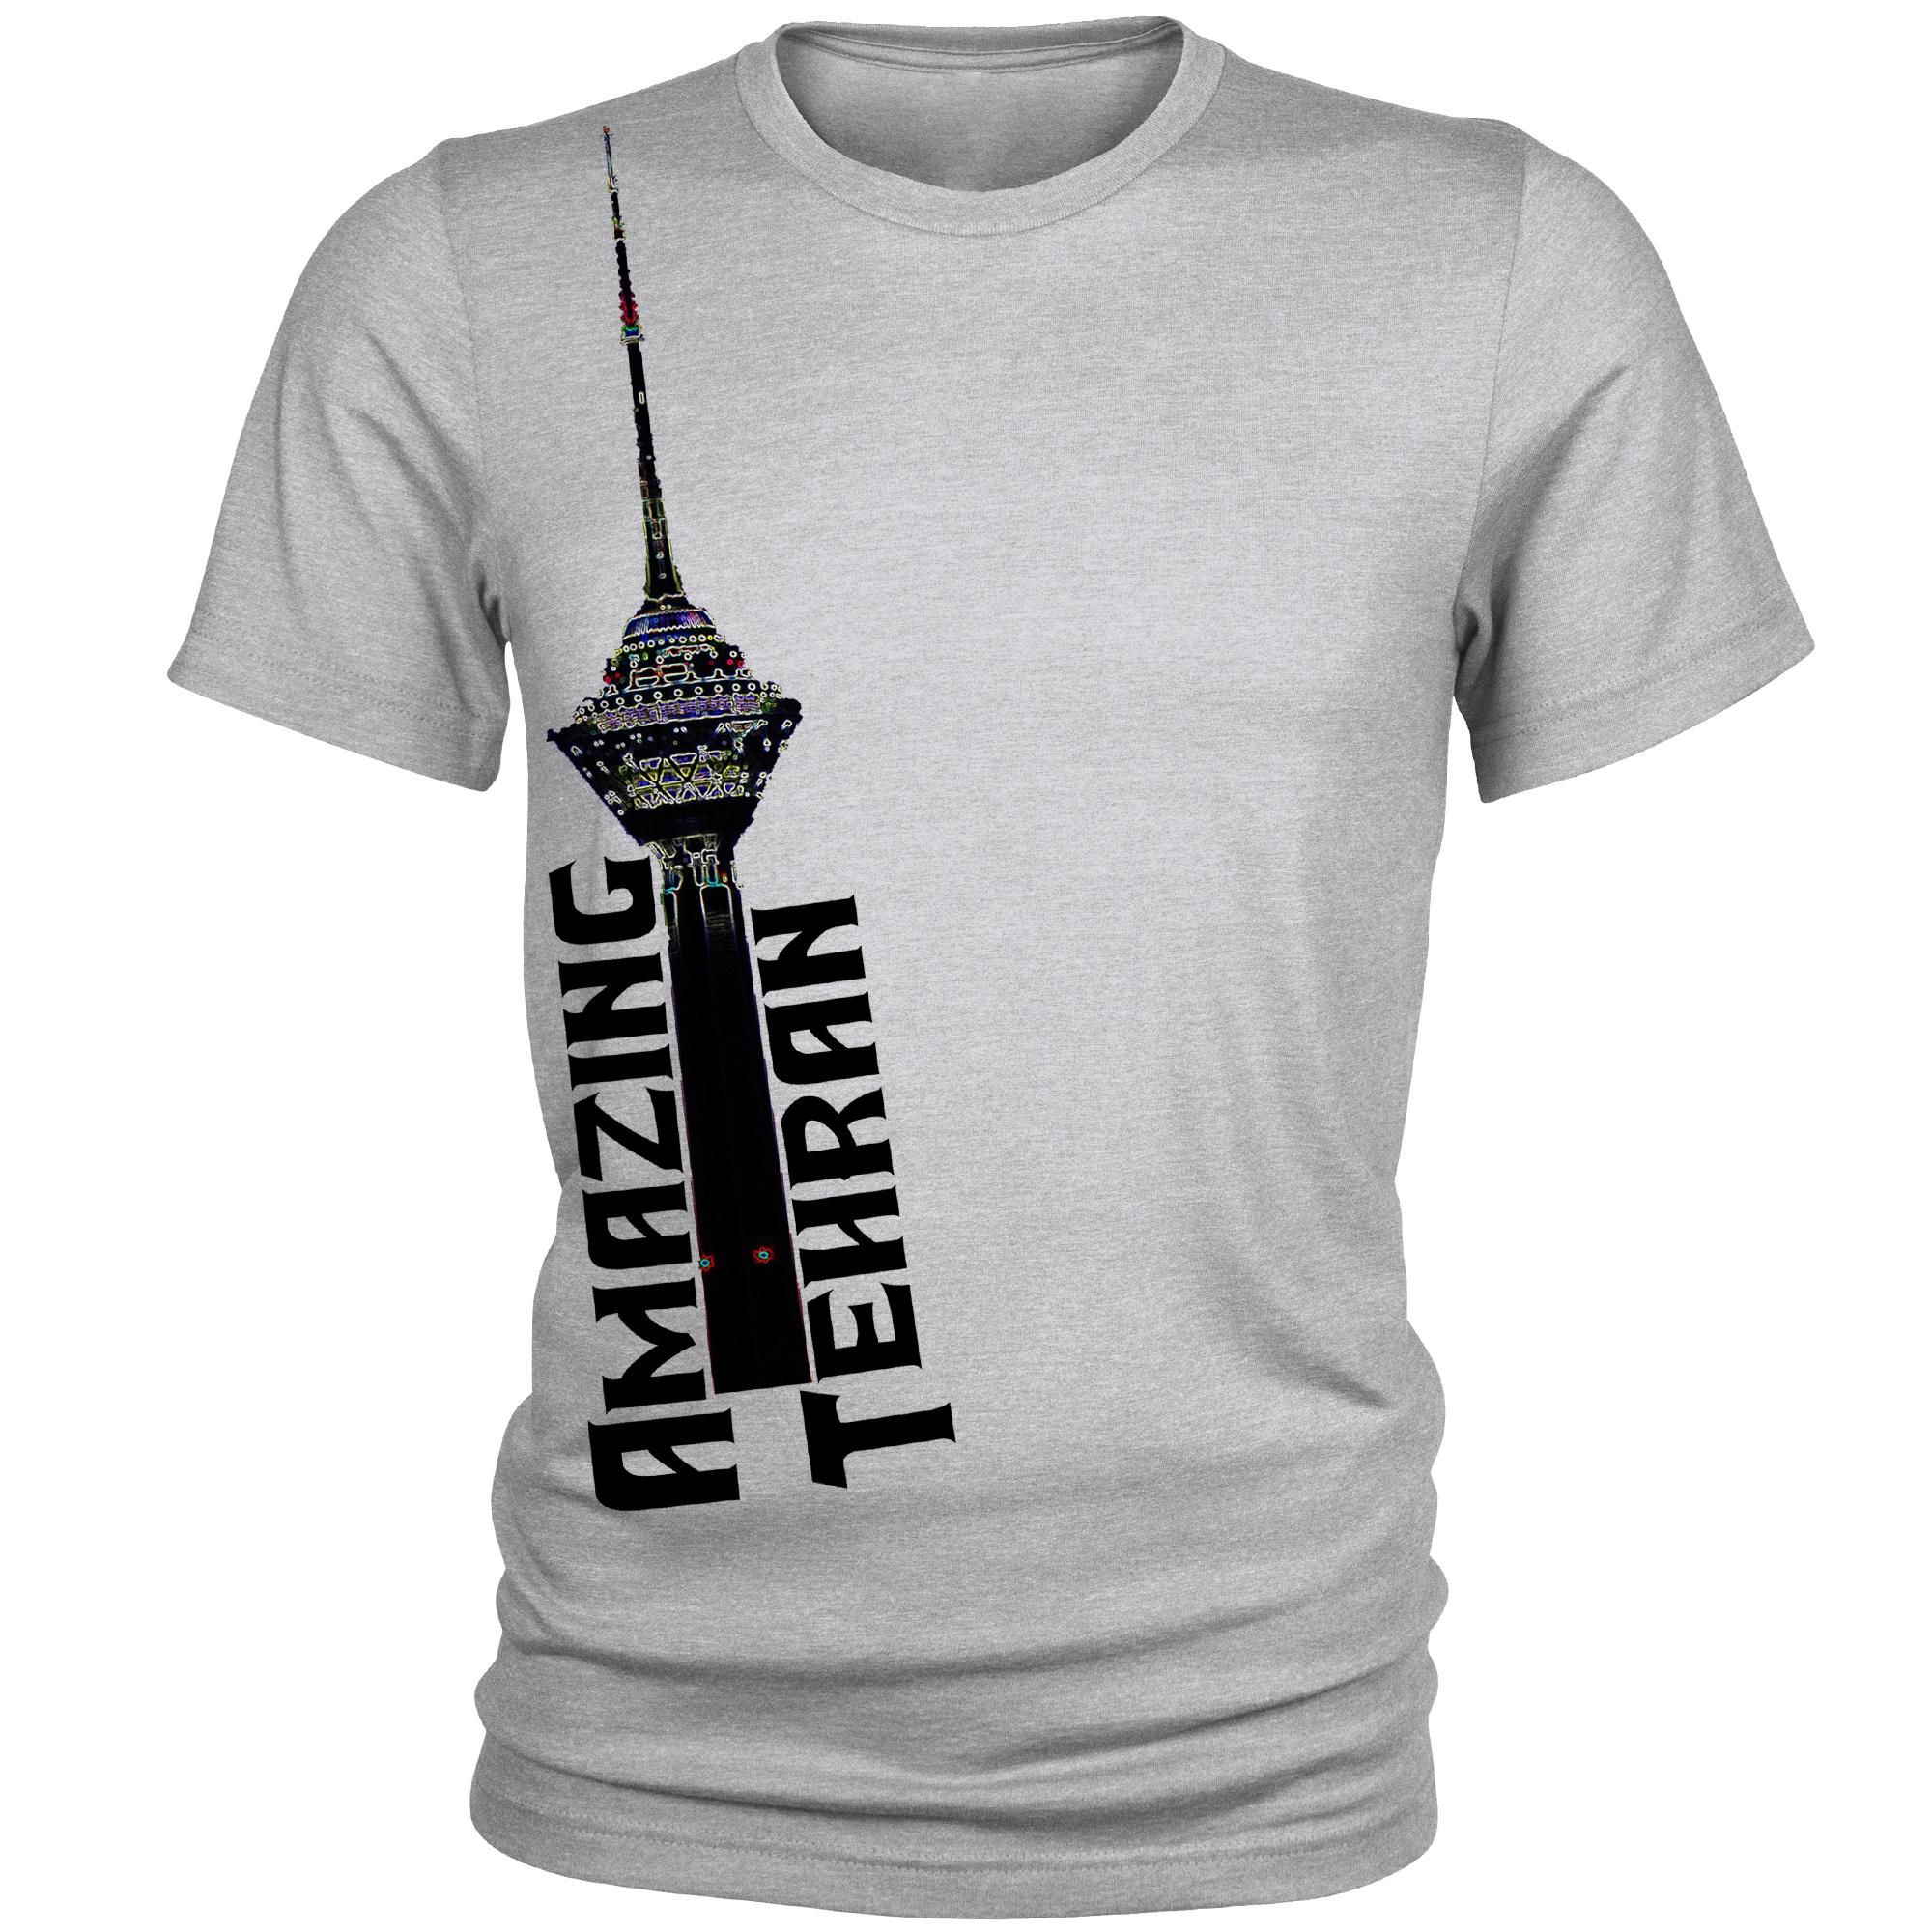 Photo of تی شرت مردانه مدل  Milad Tower کد A075